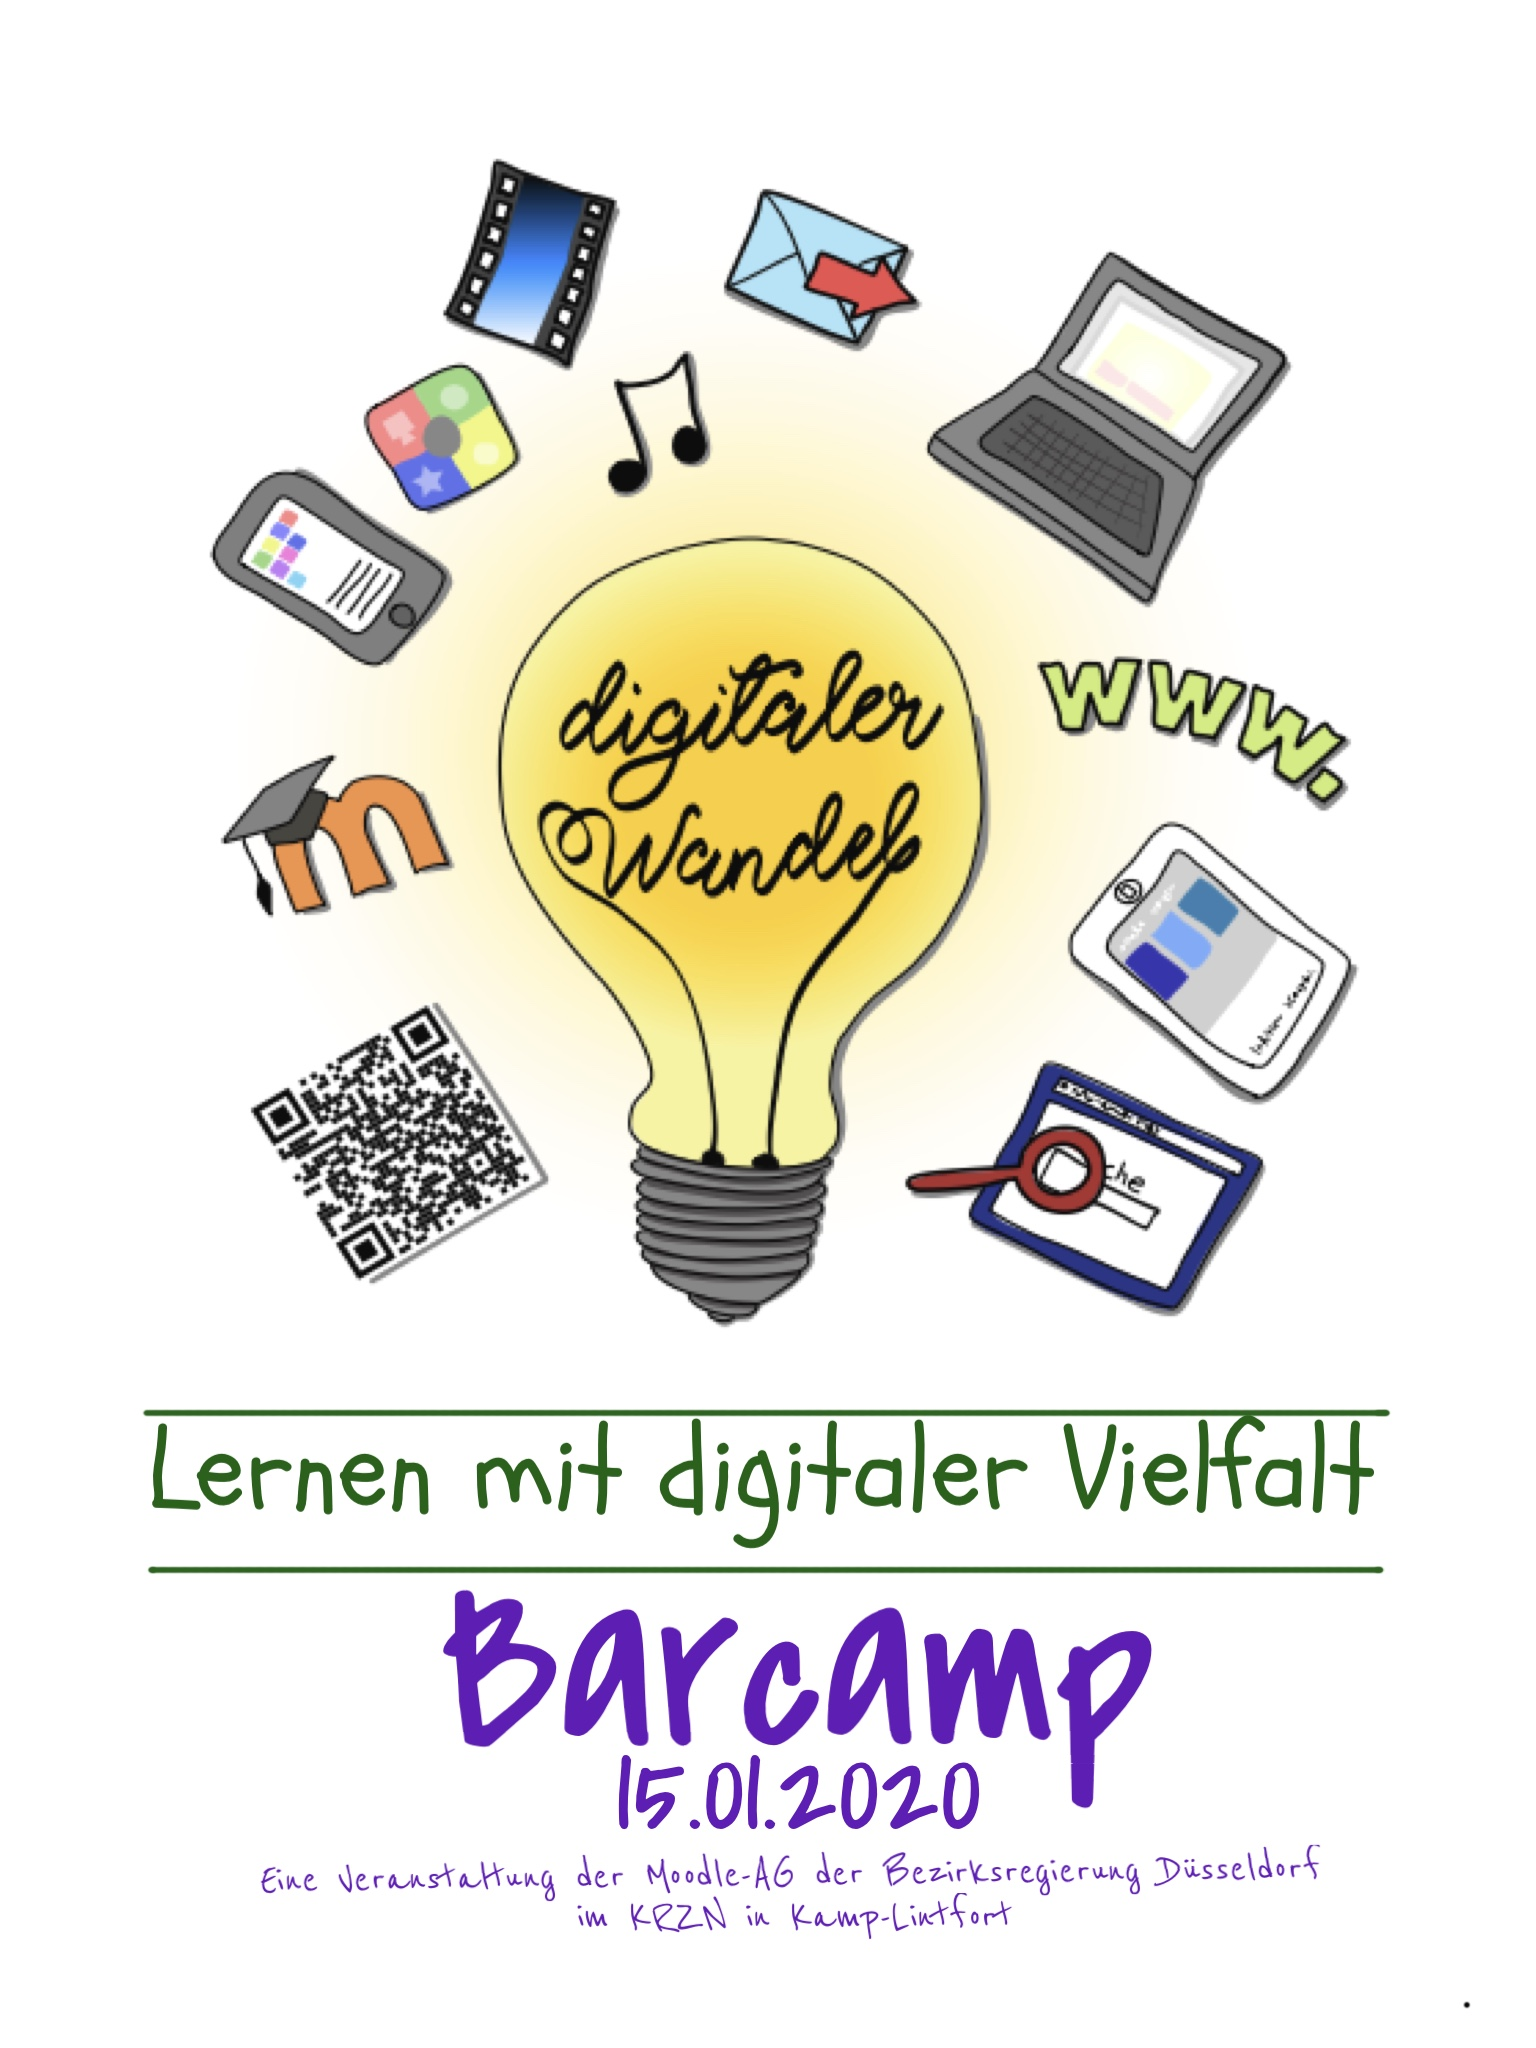 Barcamp alle